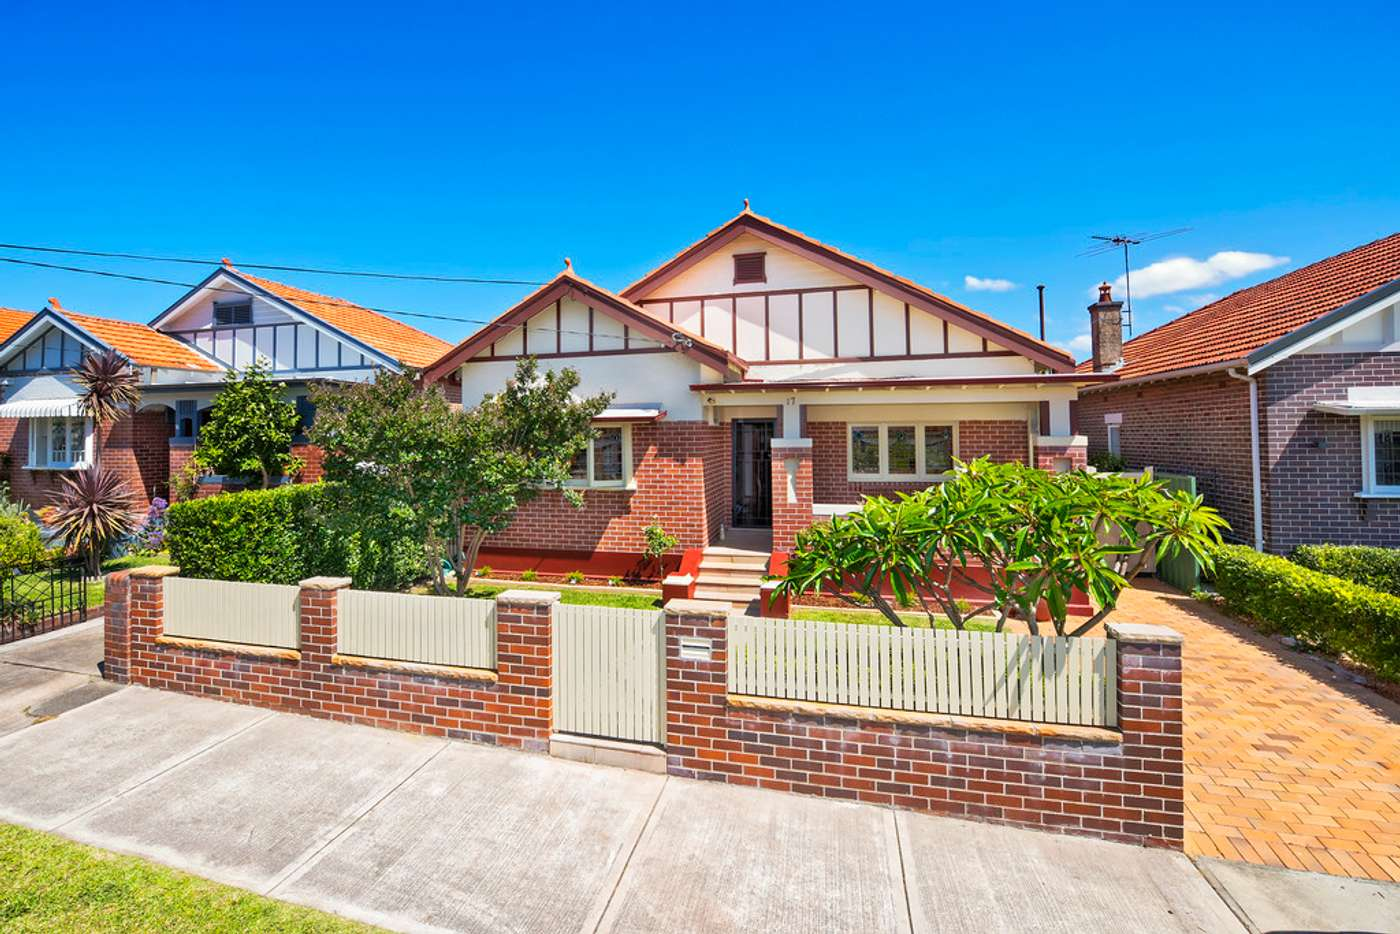 Main view of Homely house listing, 17 Kirrang Street, Wareemba NSW 2046